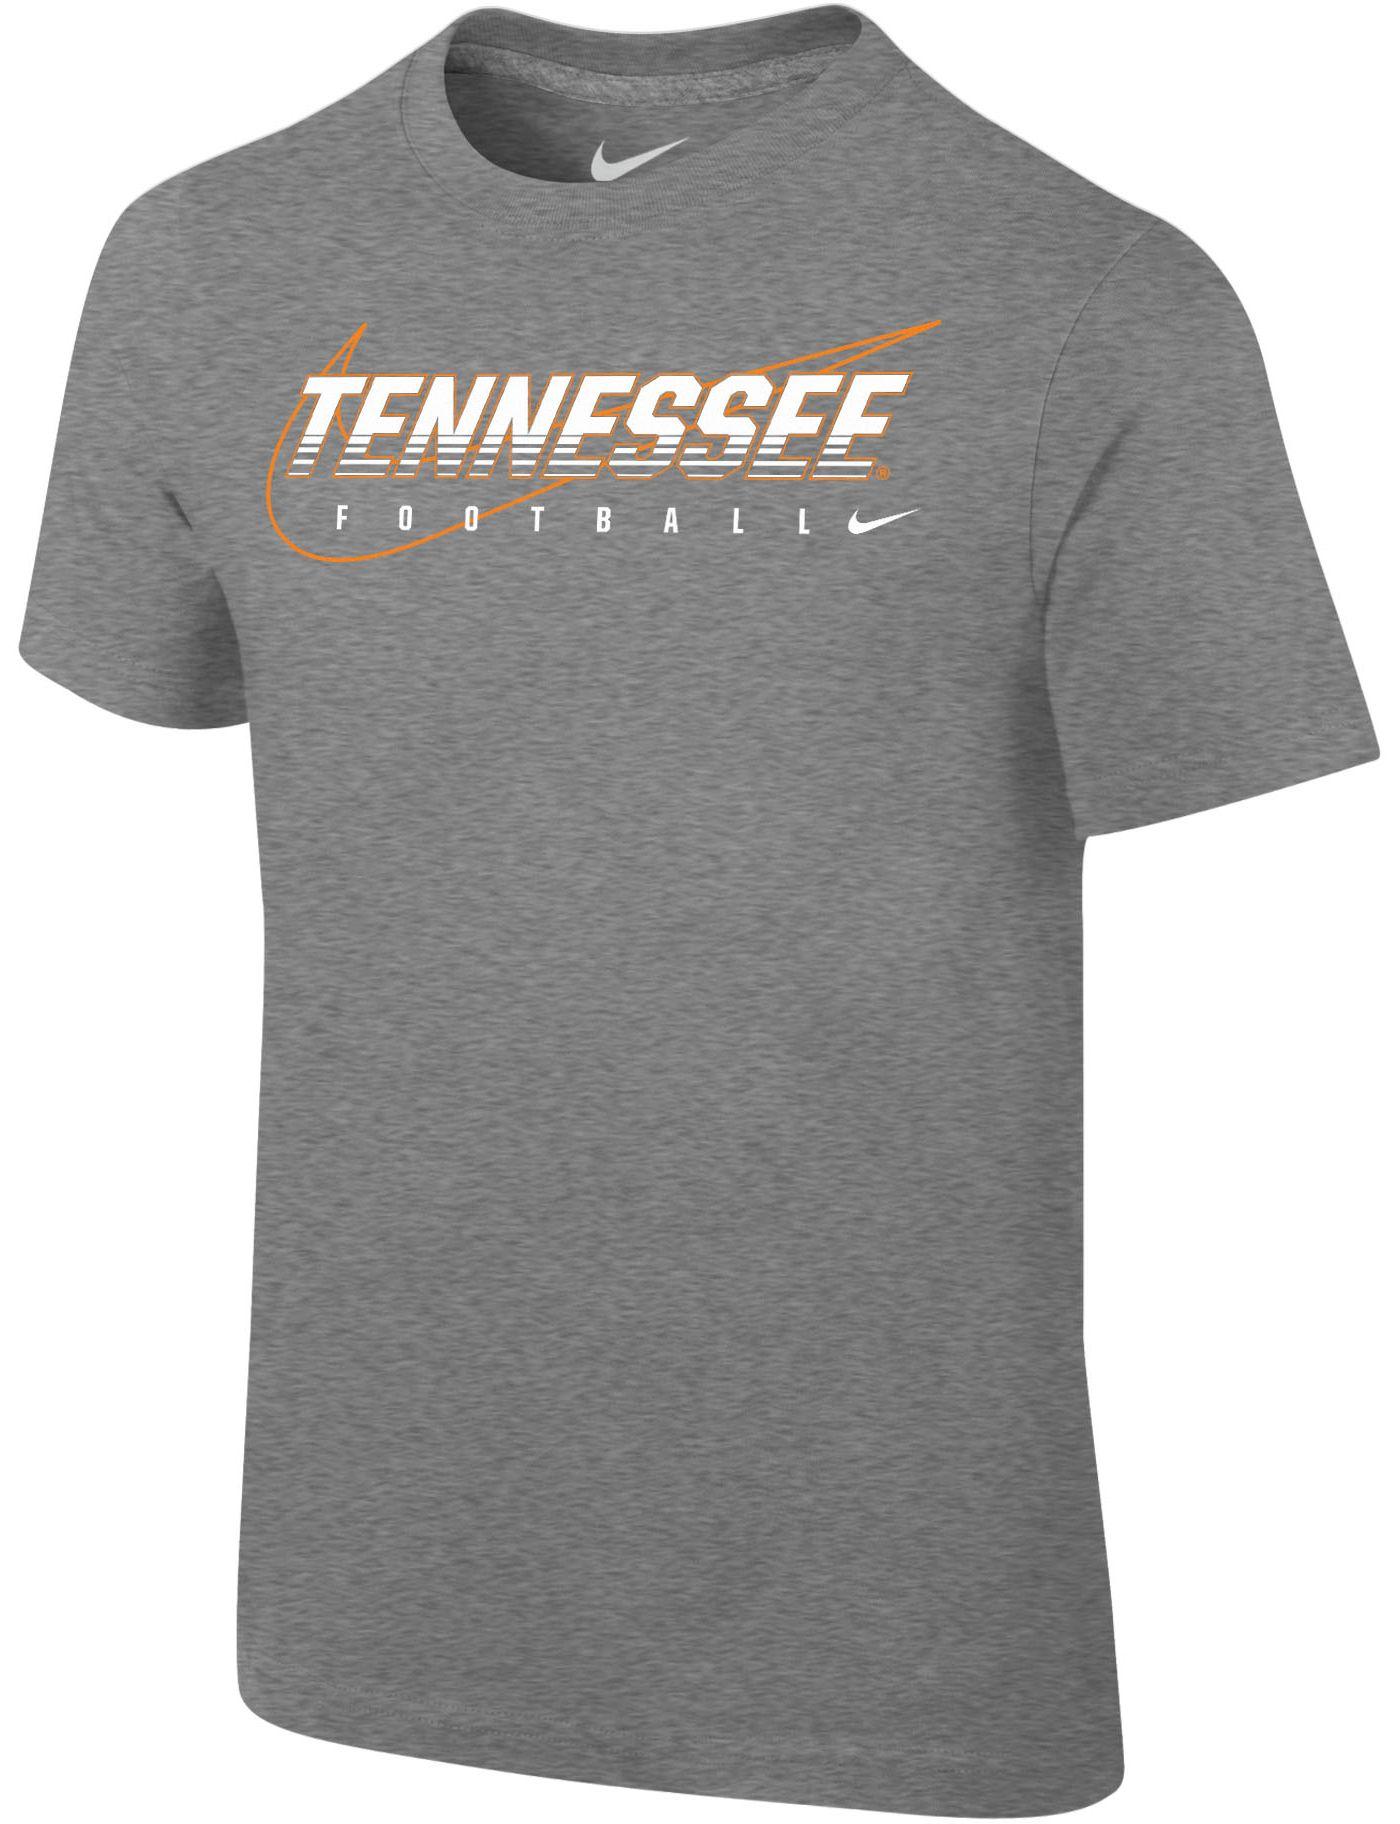 Nike Youth Tennessee Volunteers Grey Football Dri-FIT Cotton Preschool Facility T-Shirt